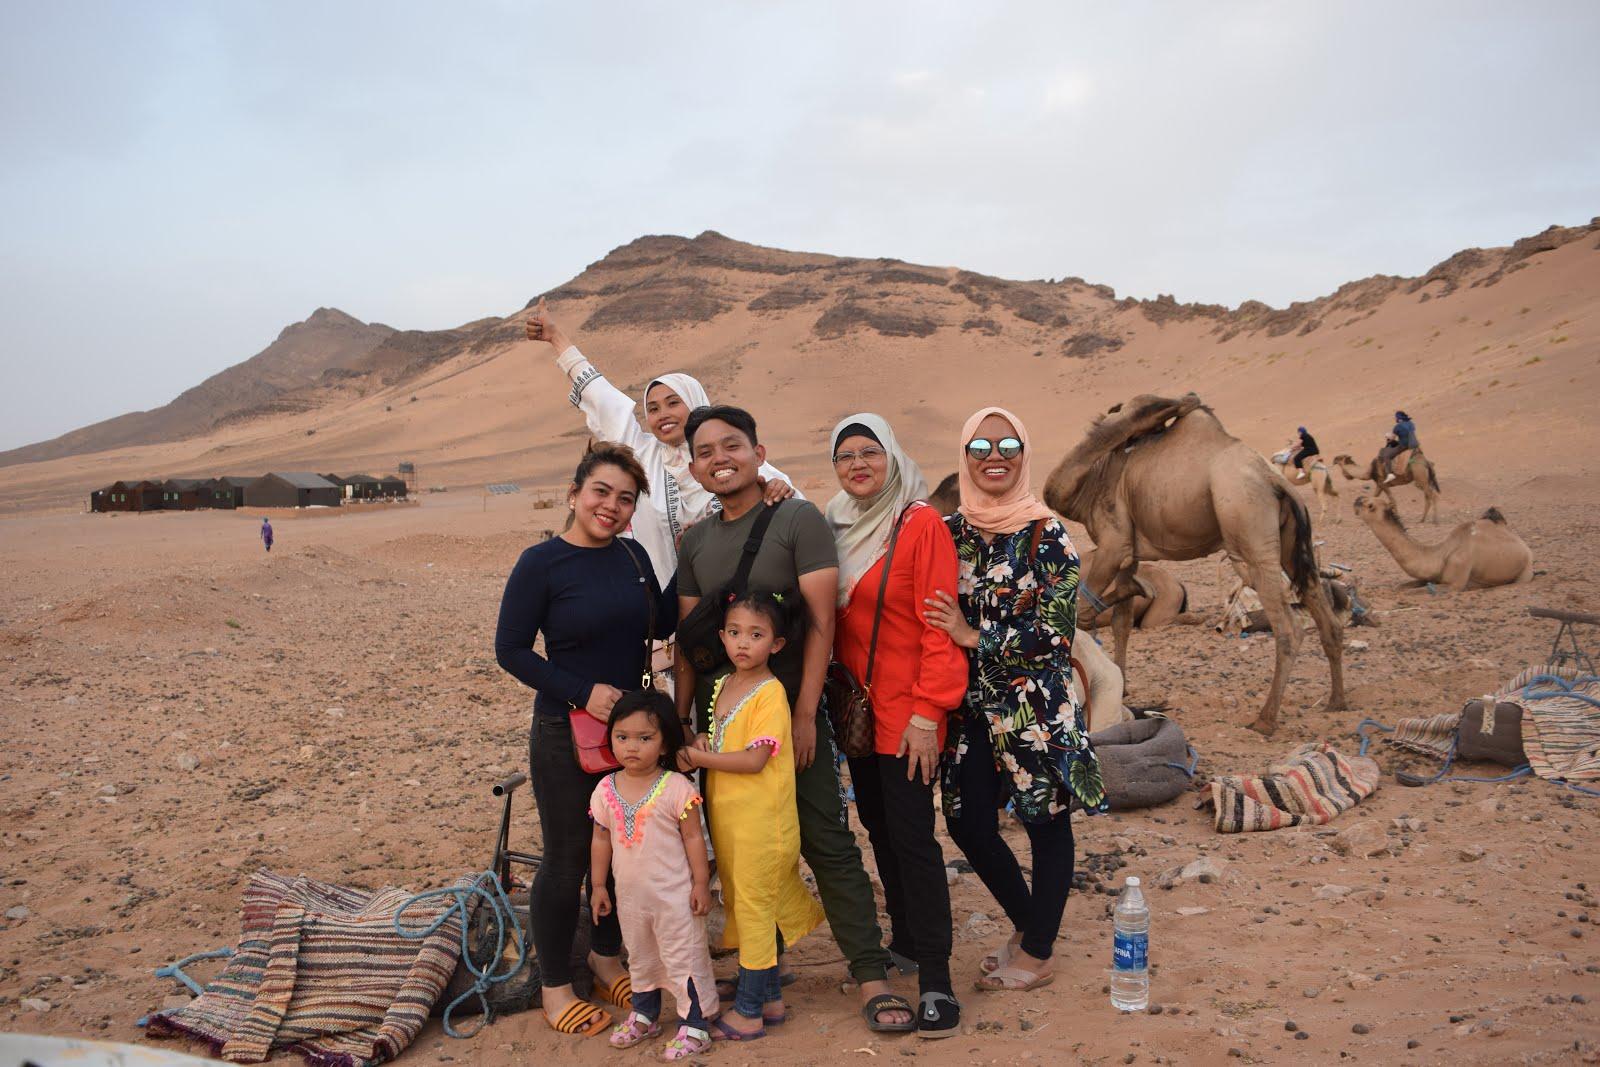 Nekhla Dunes 07-2019